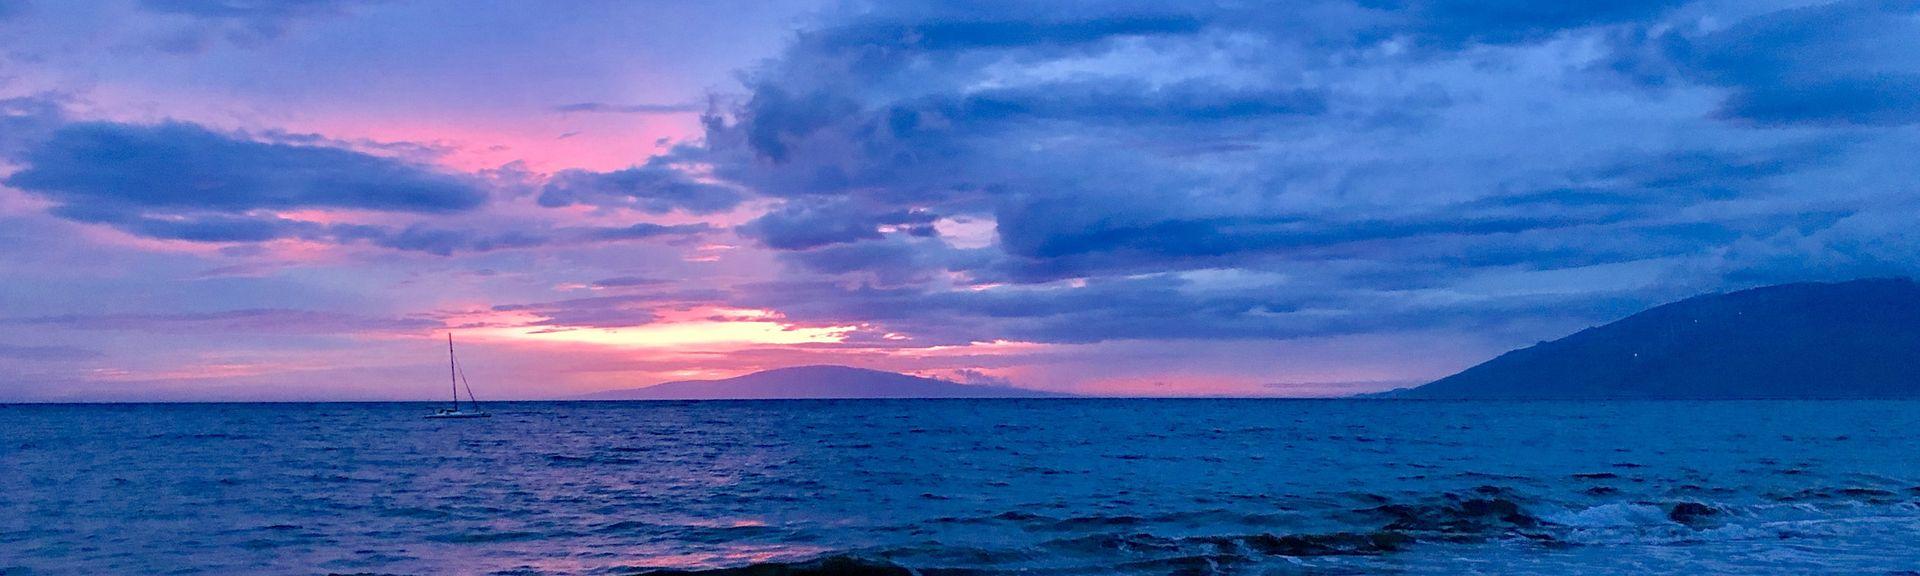 Kalama Beach Park, Kihei, Hawaii, United States of America